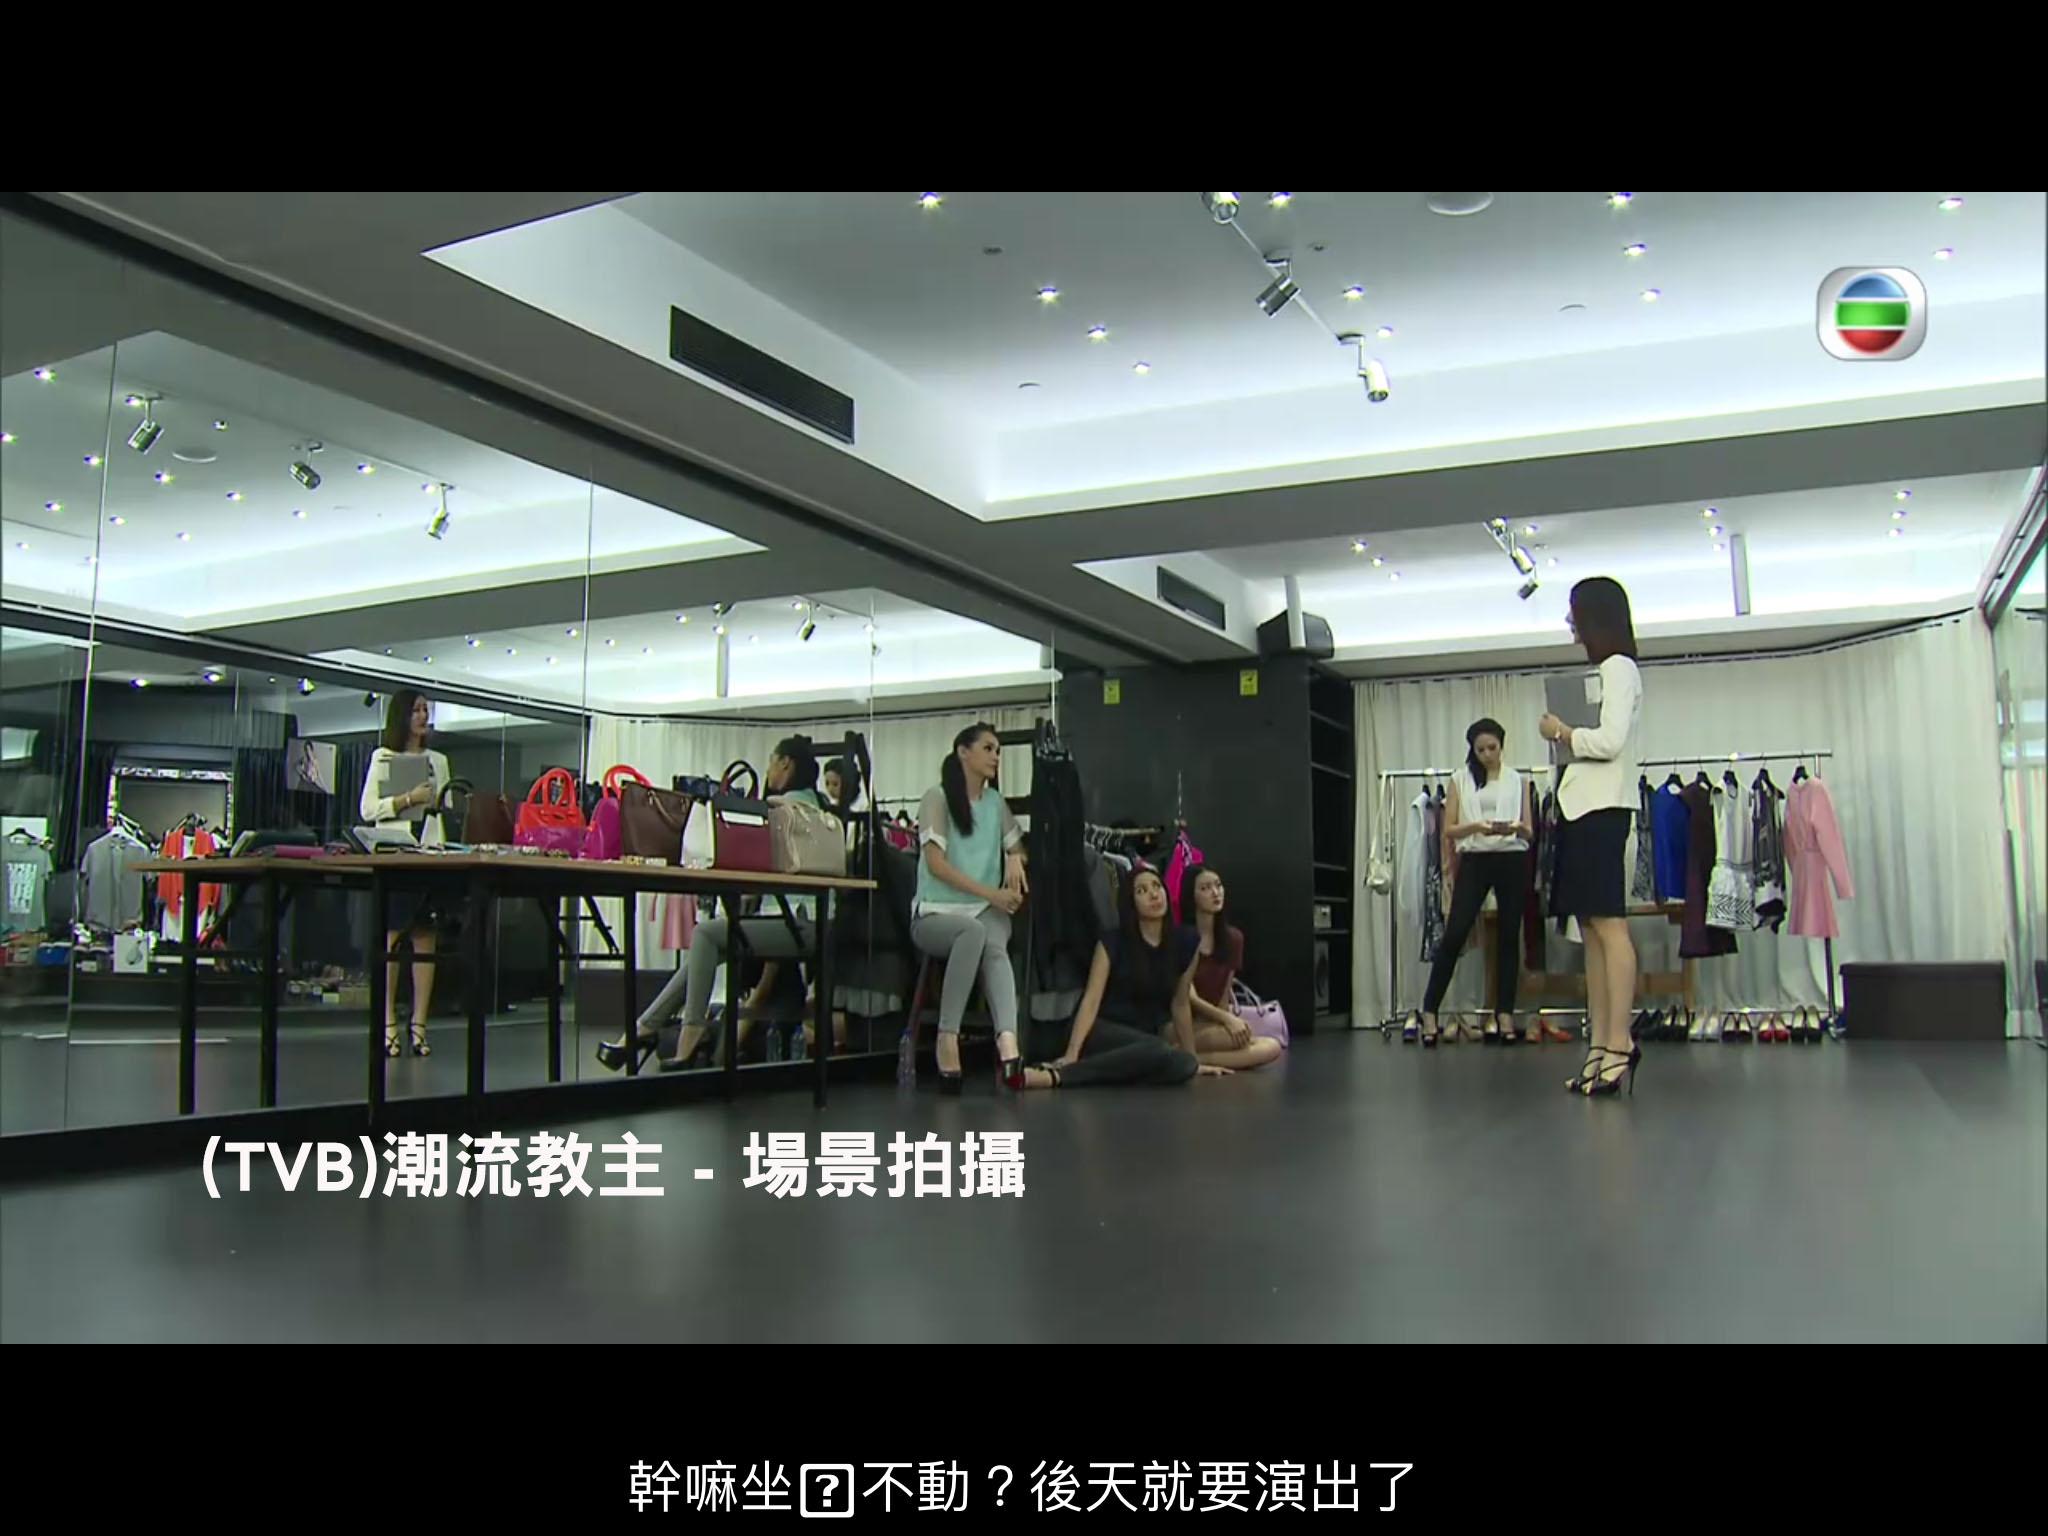 E2(TVB)潮流教主 - 場景拍攝